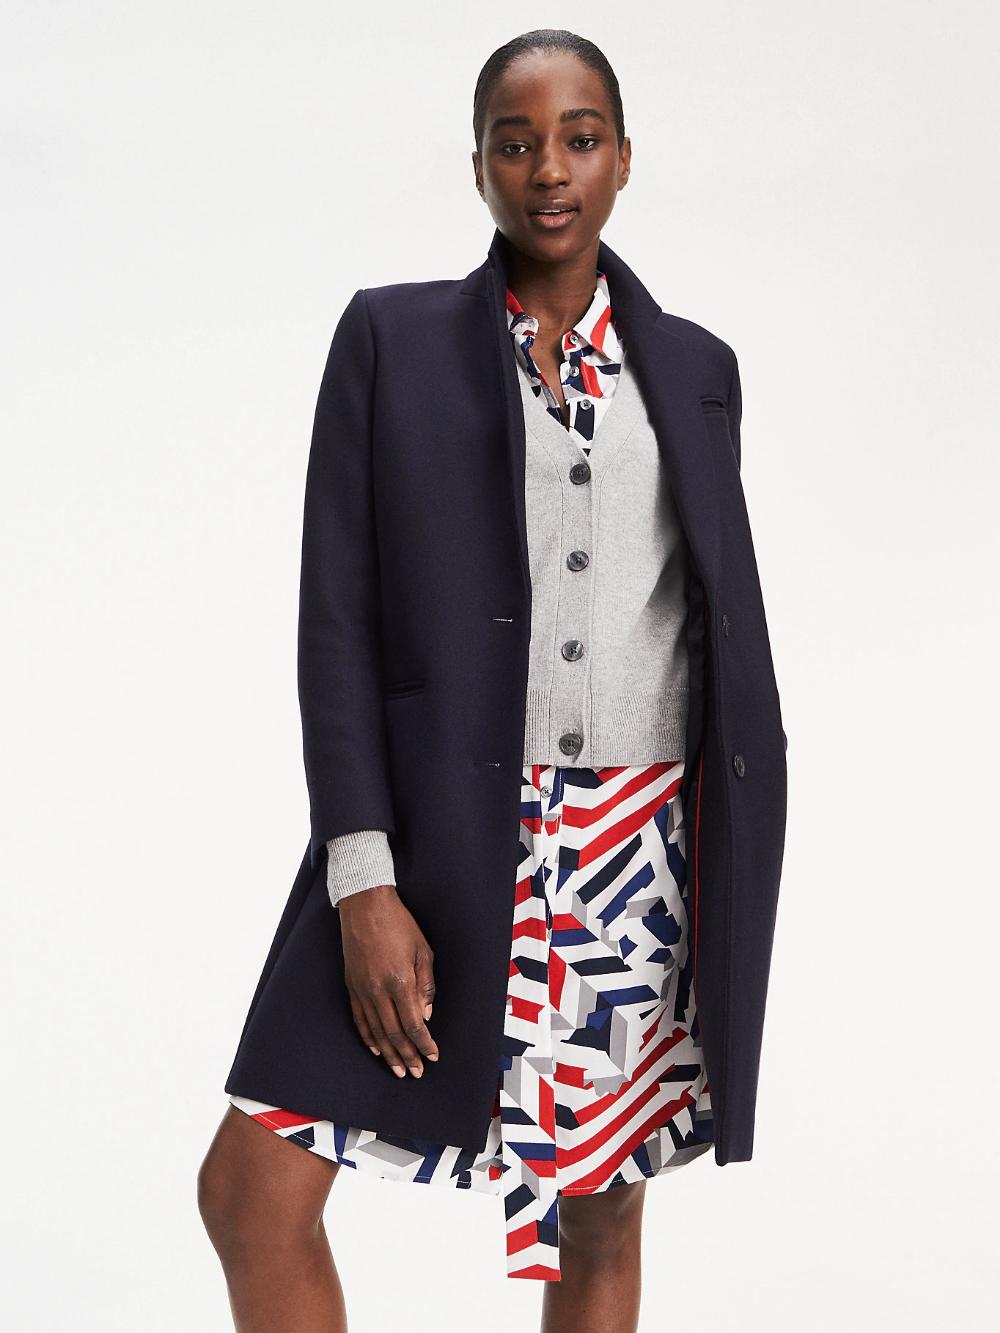 Wool Blend Classic Coat Blue Tommy Hilfiger Coats For Women Women S Coats Jackets Outerwear Jackets [ 1333 x 1000 Pixel ]